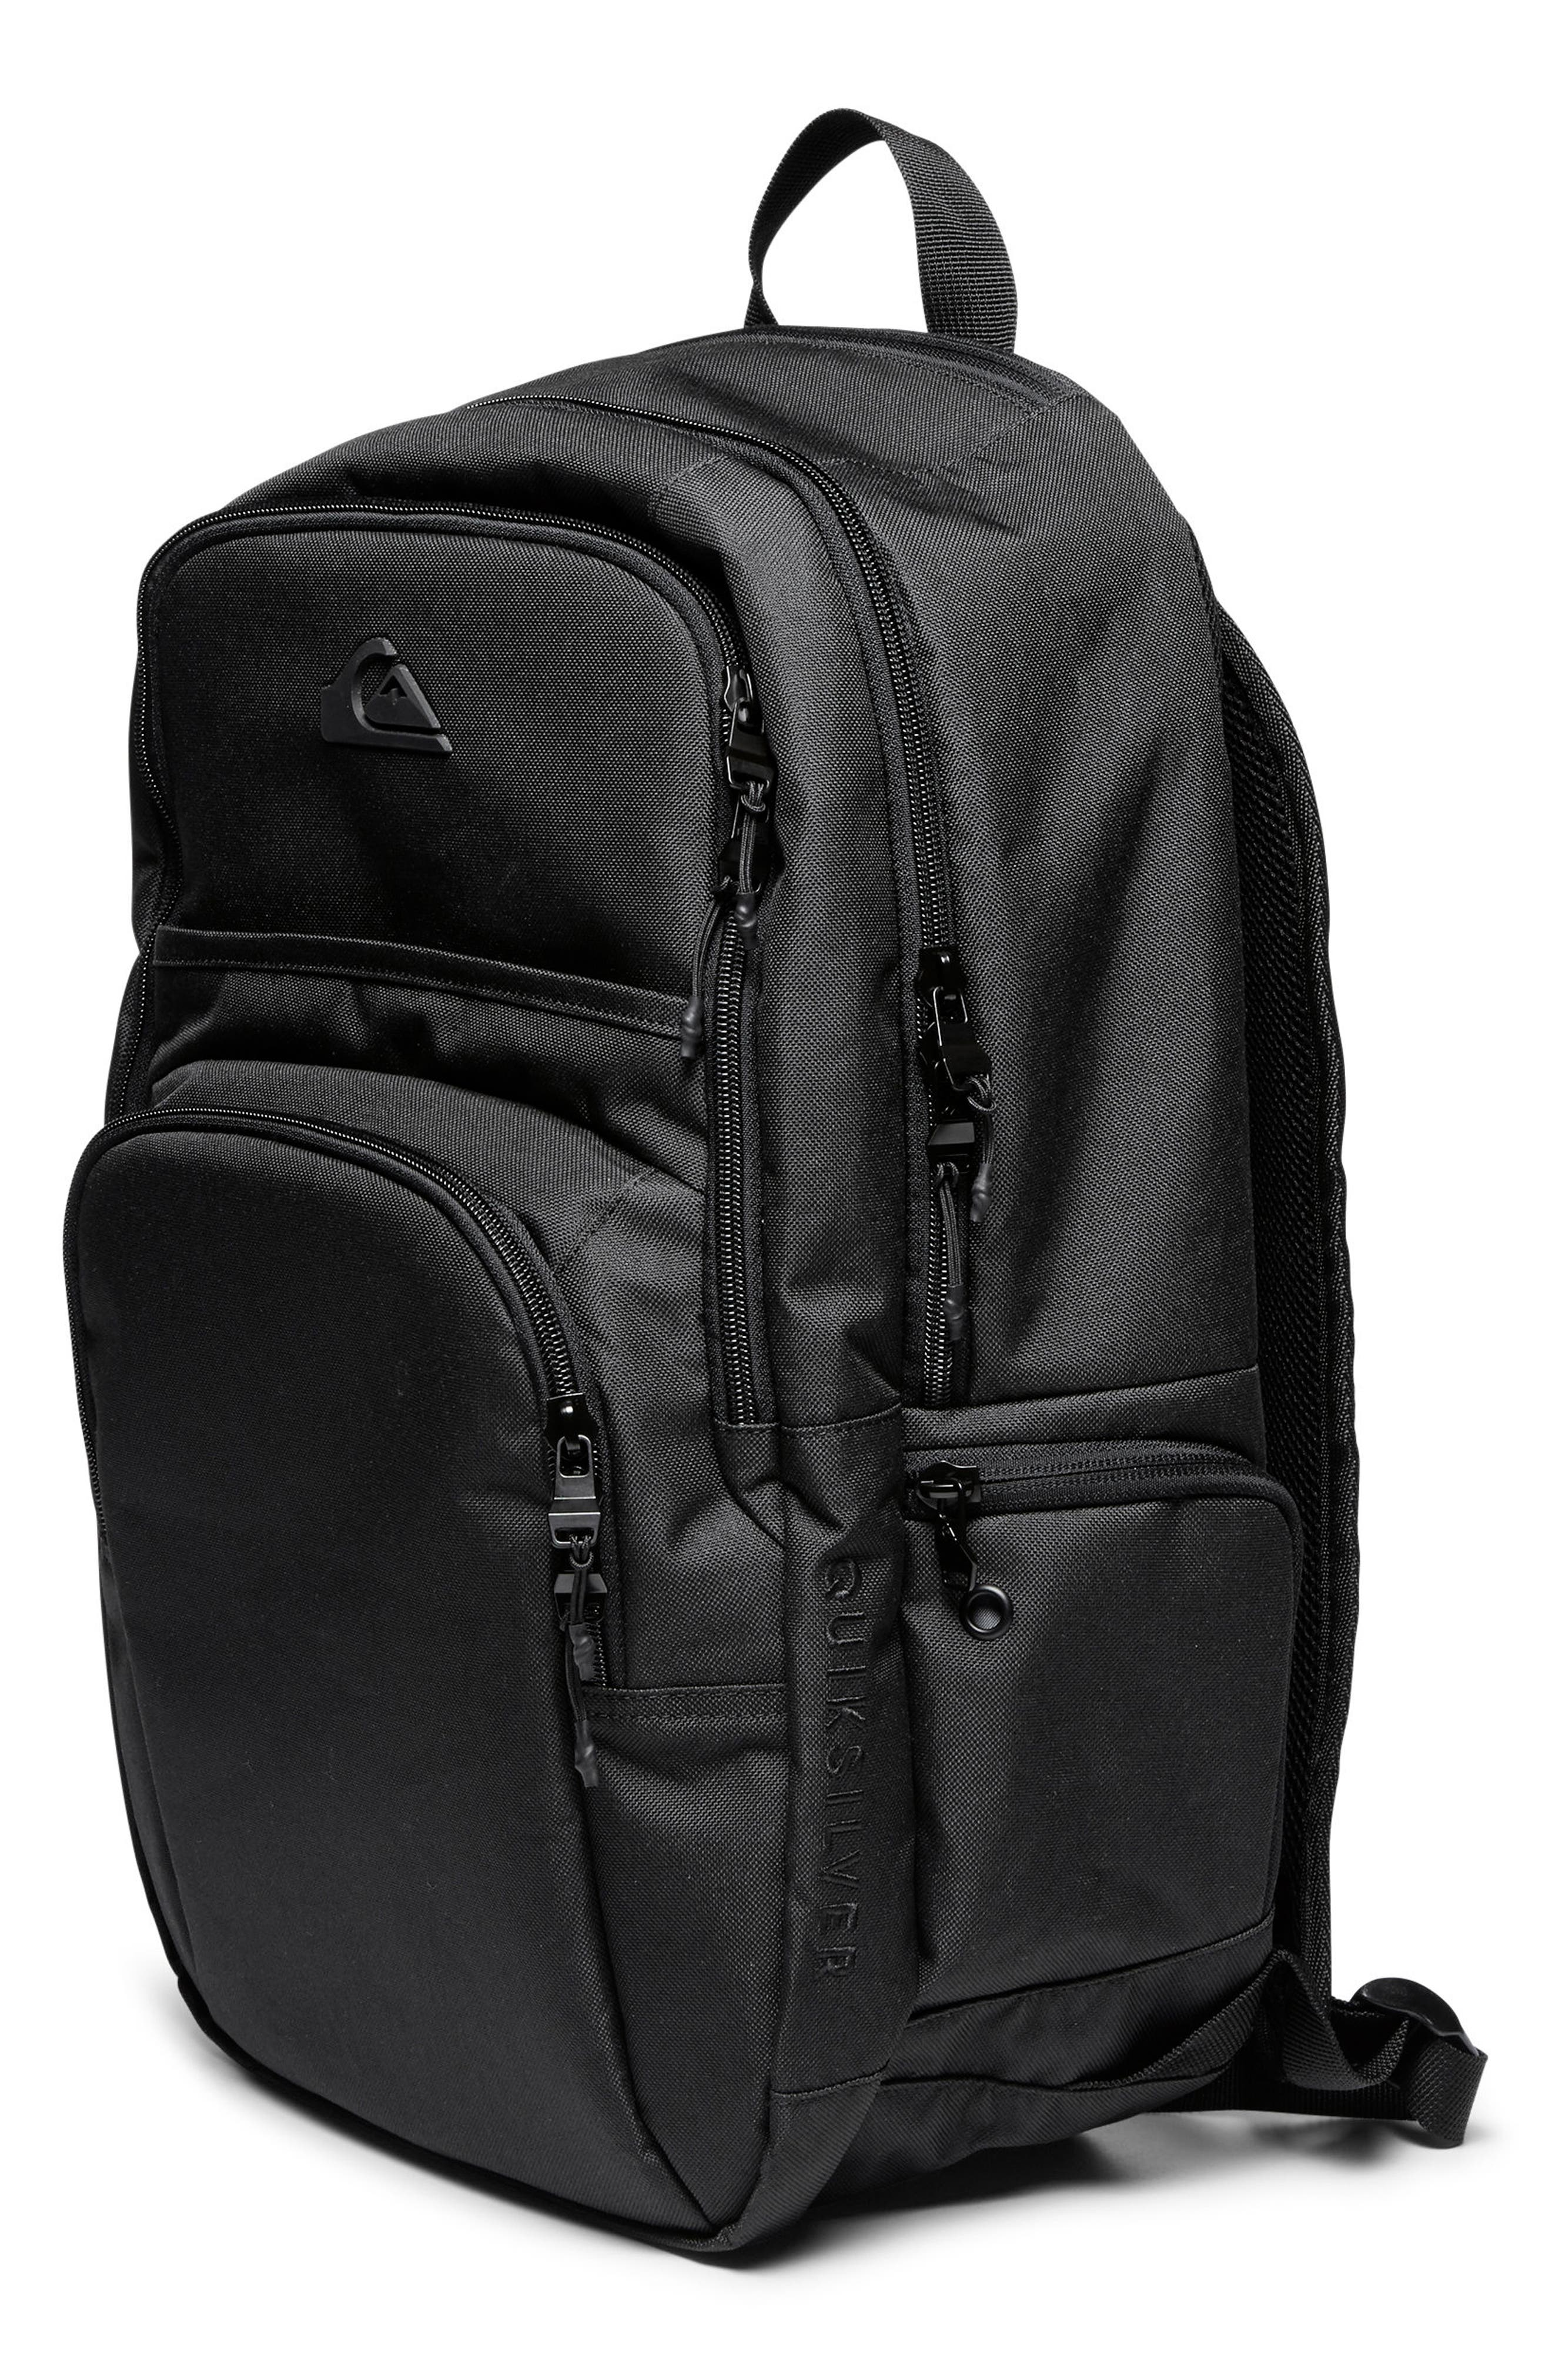 Diaper Backpack,                             Alternate thumbnail 2, color,                             BLACK